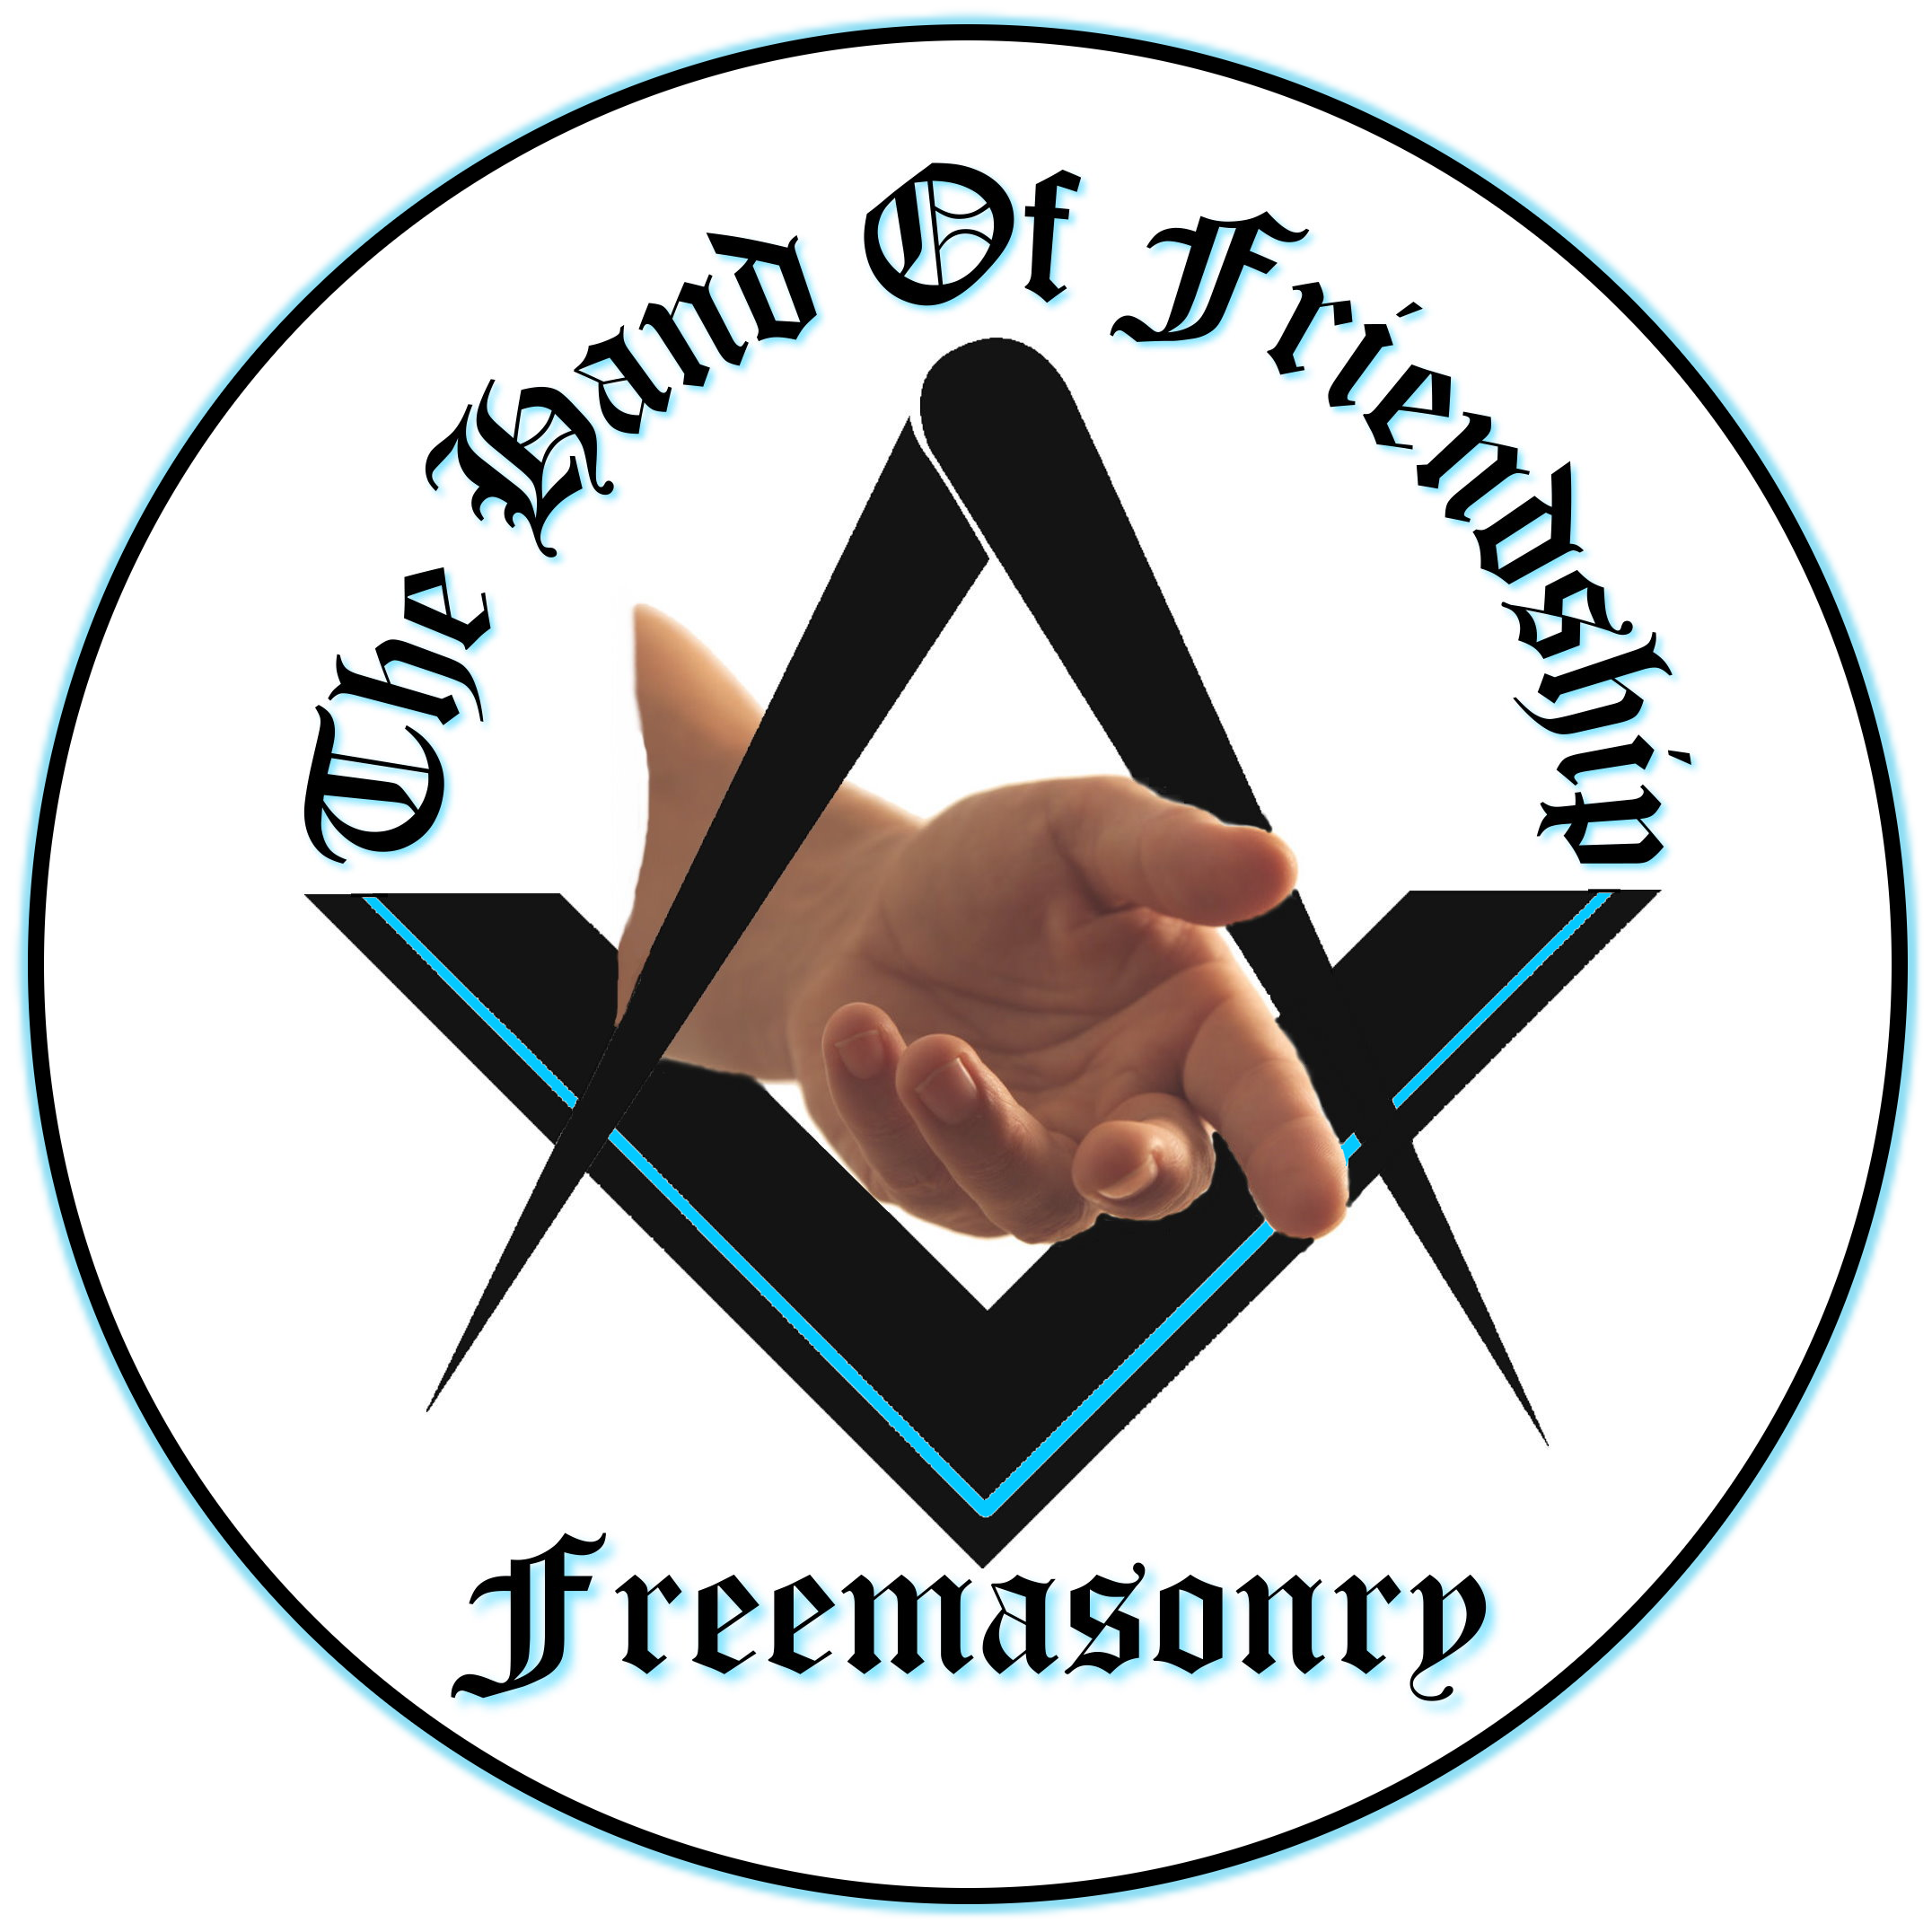 Friendship clipart friendship hand. Freemasonry the of free